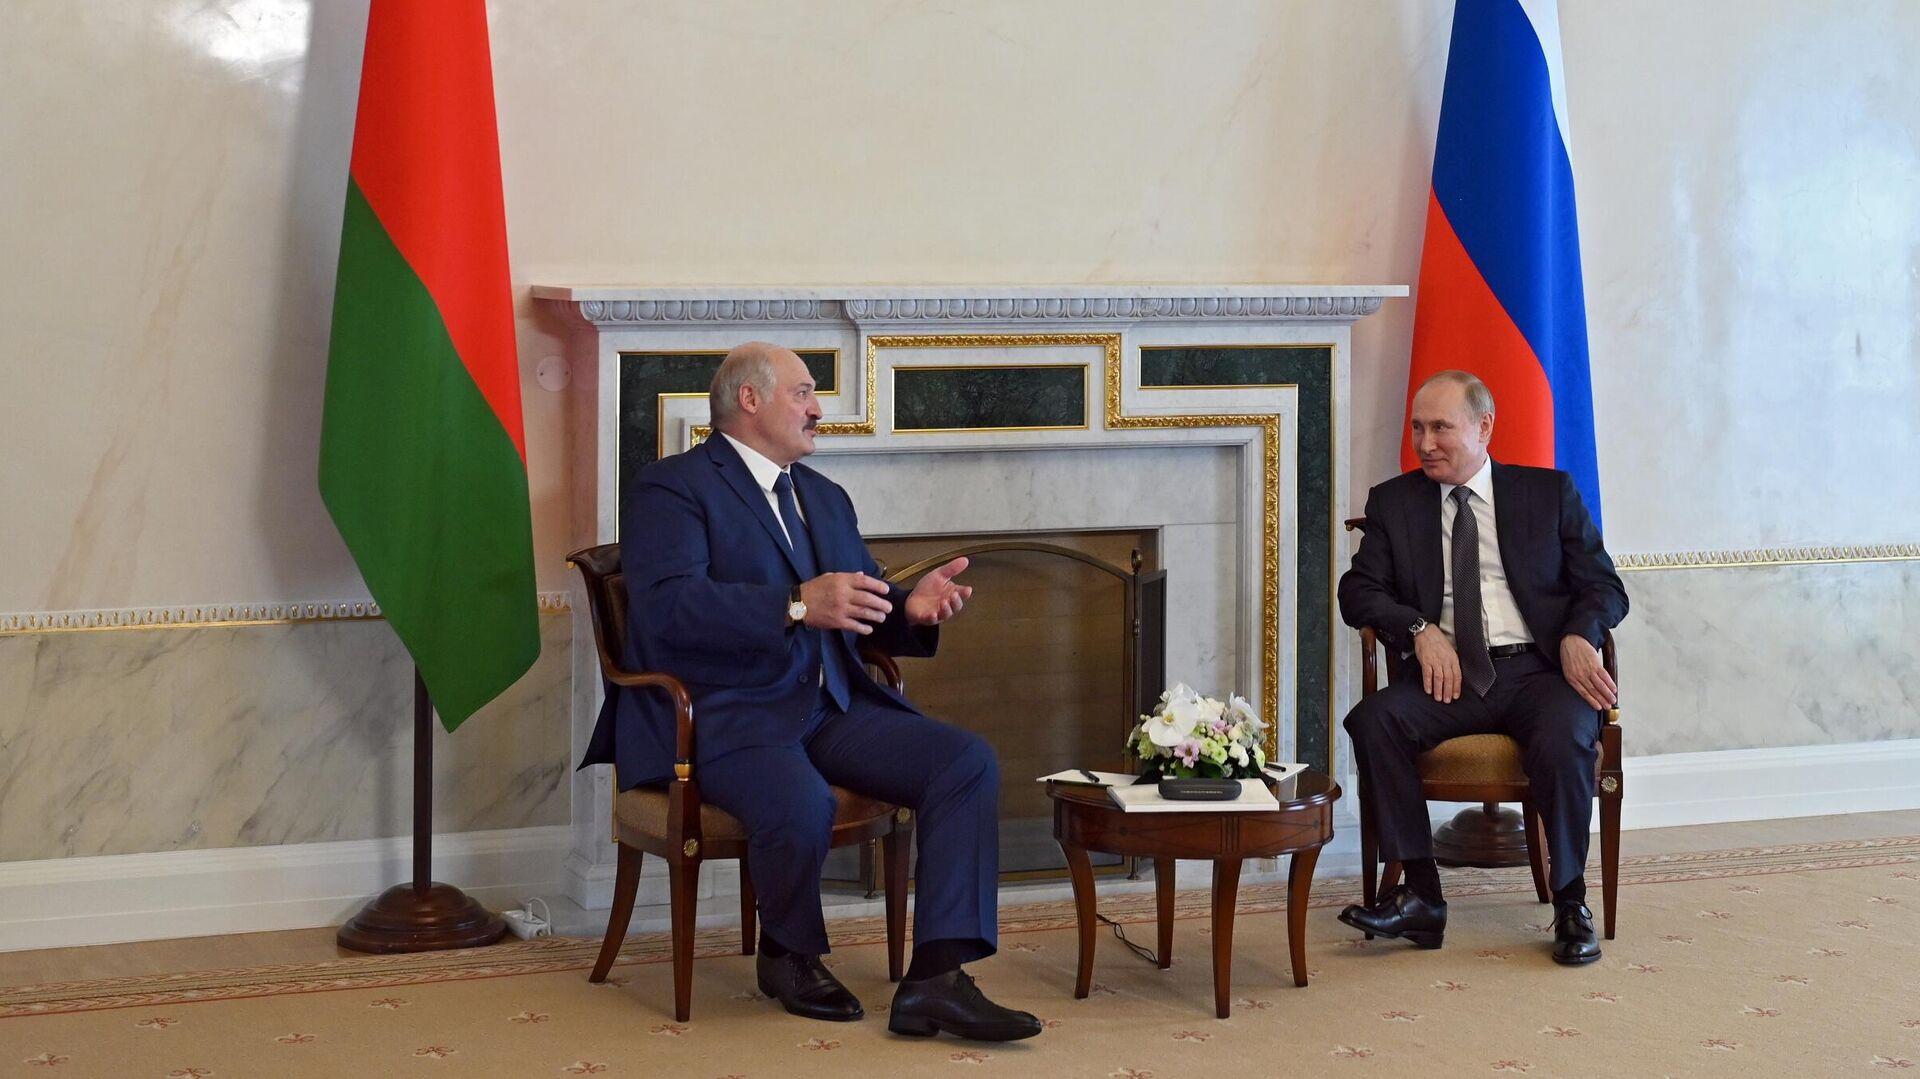 Президент РФ Владимир Путин и президент Белоруссии Александр Лукашенко  во время встречи - РИА Новости, 1920, 14.07.2021